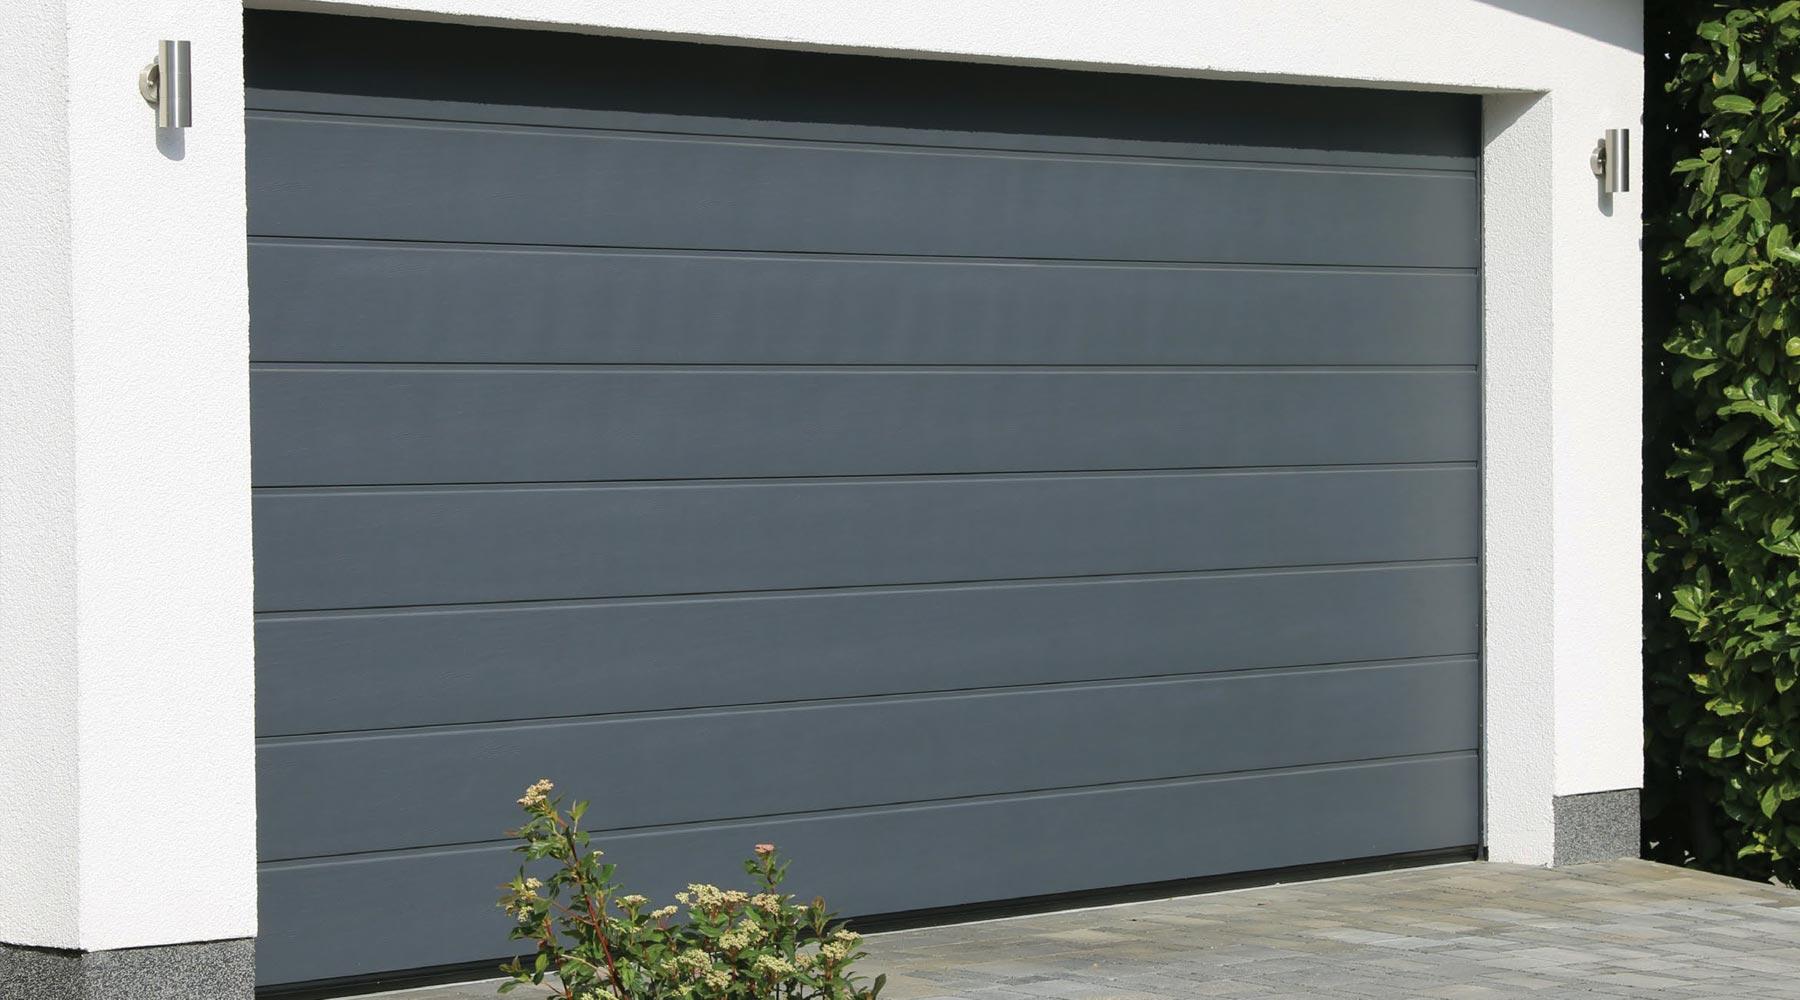 bramy-garażowe-oferta-nk3